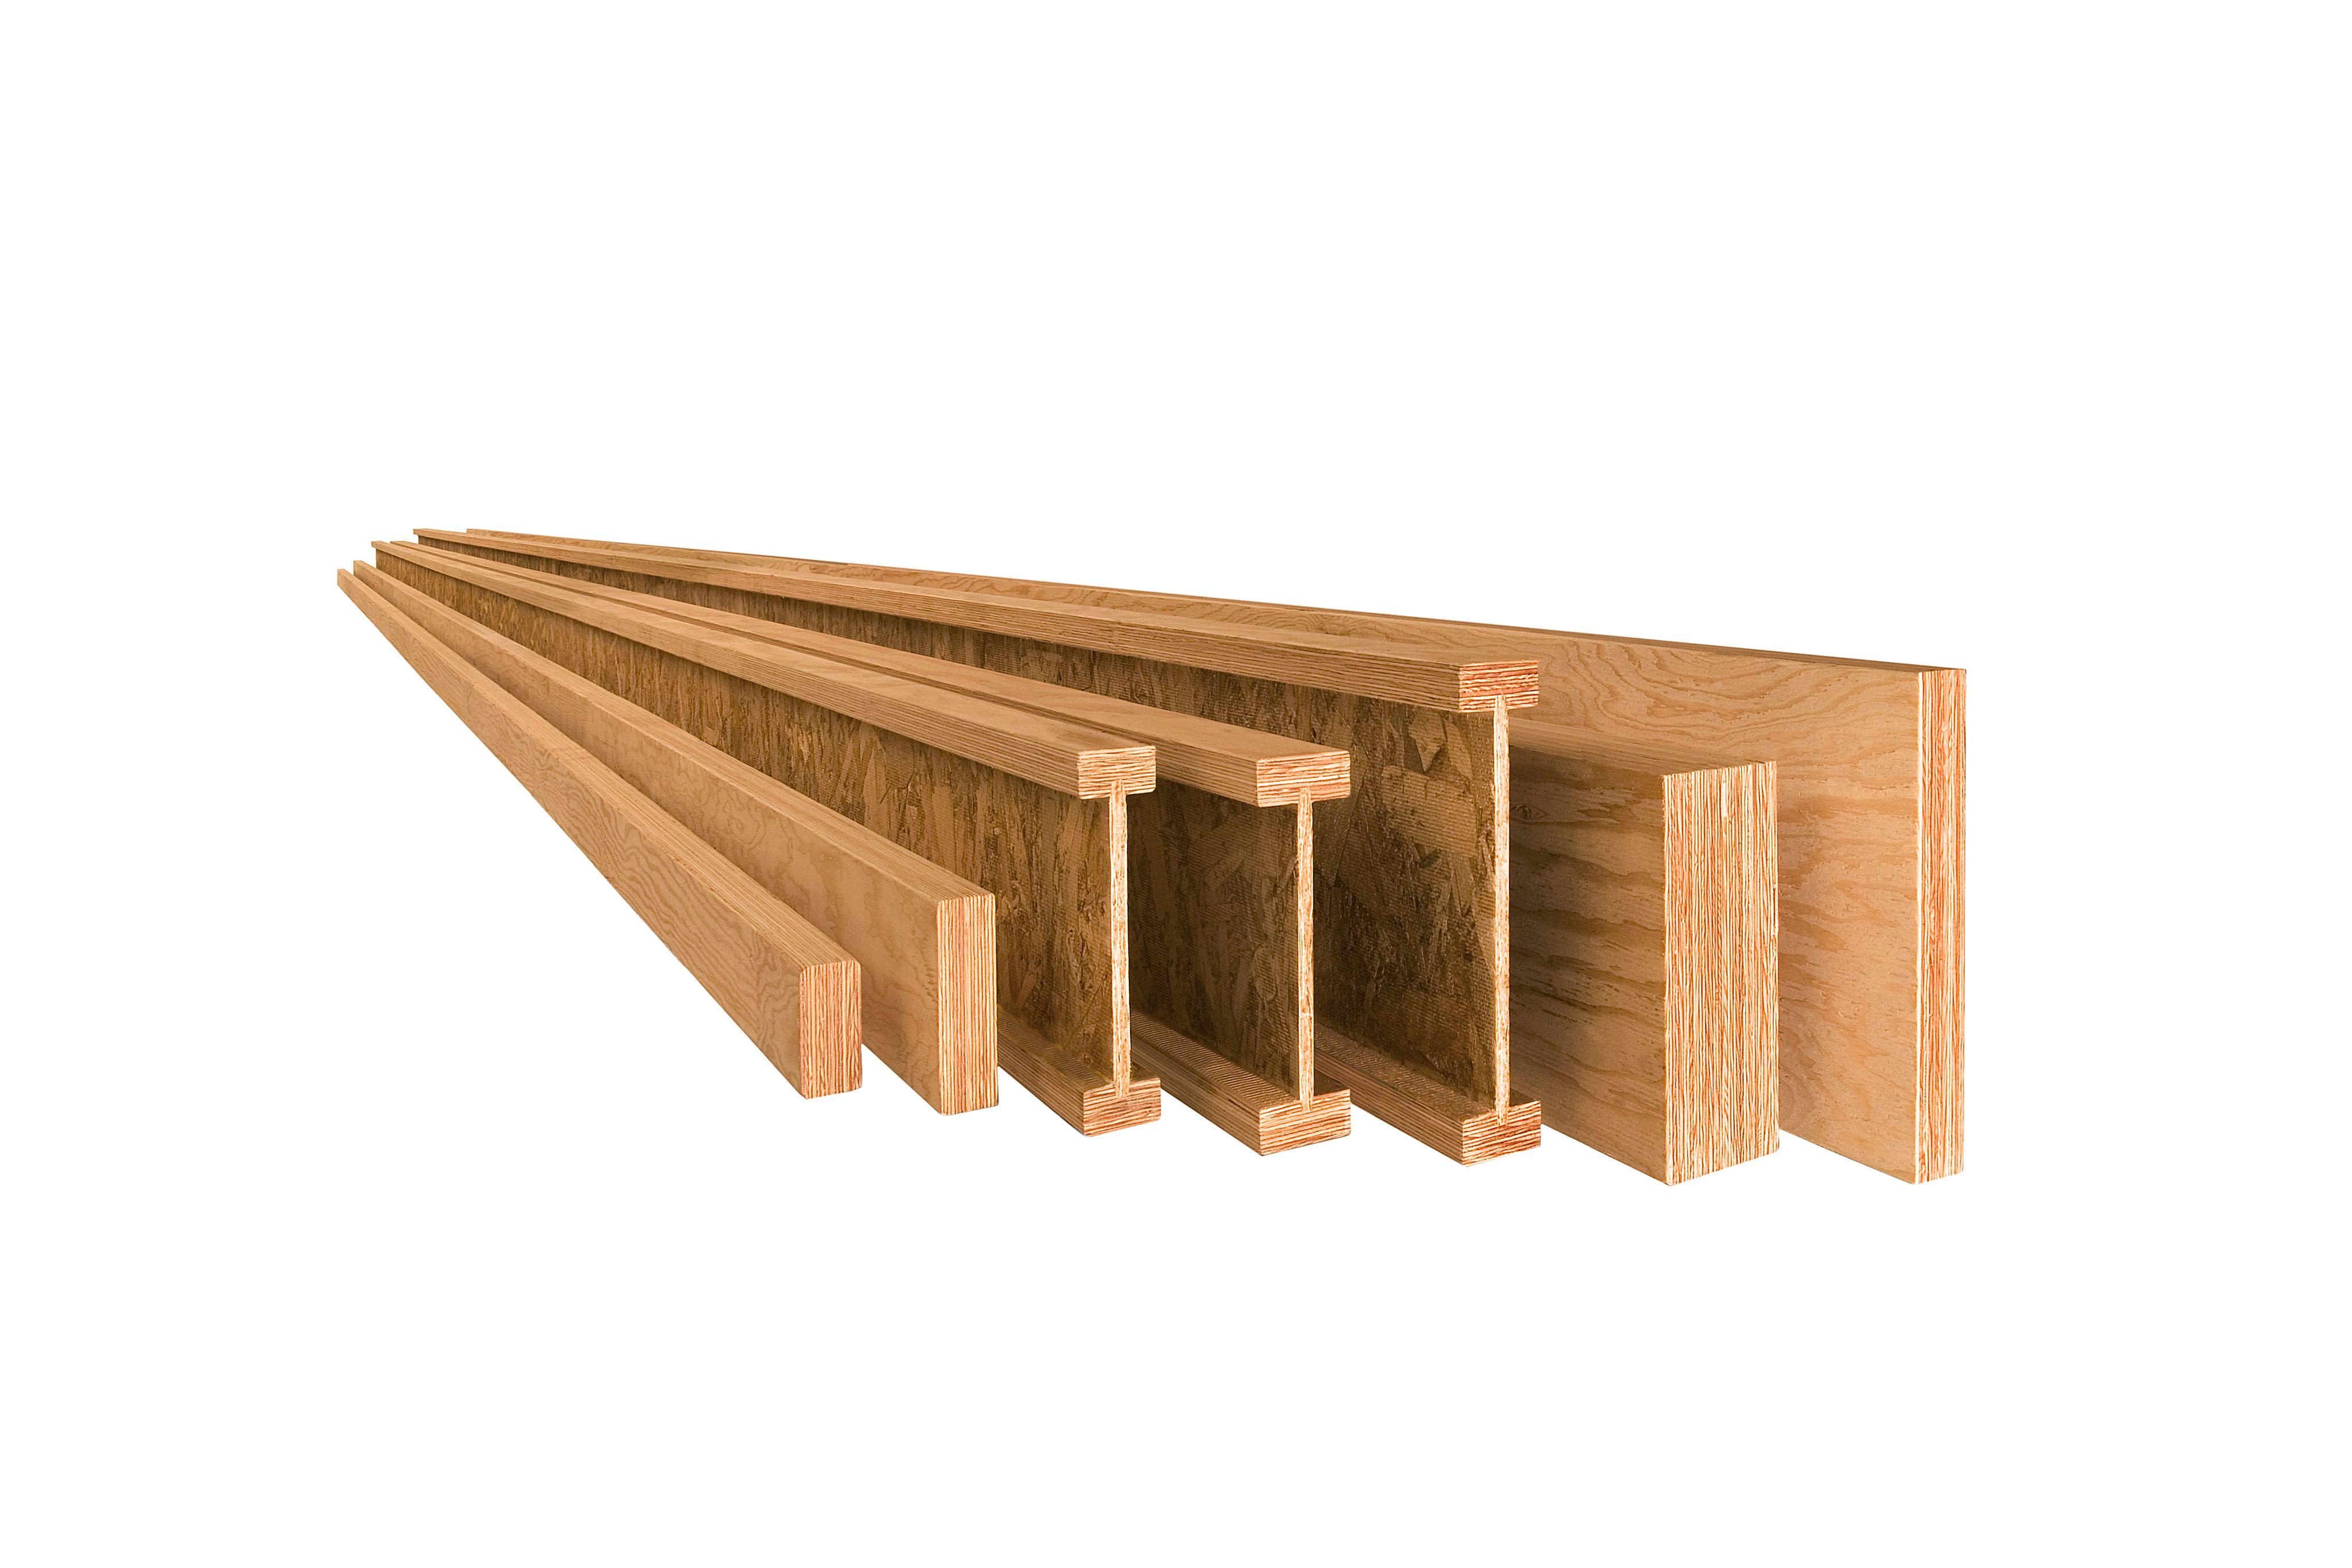 Boise Cascade Engineered Wood Lvl Types And Sizes Laminated Veneer Lumber Engineered Wood Wood